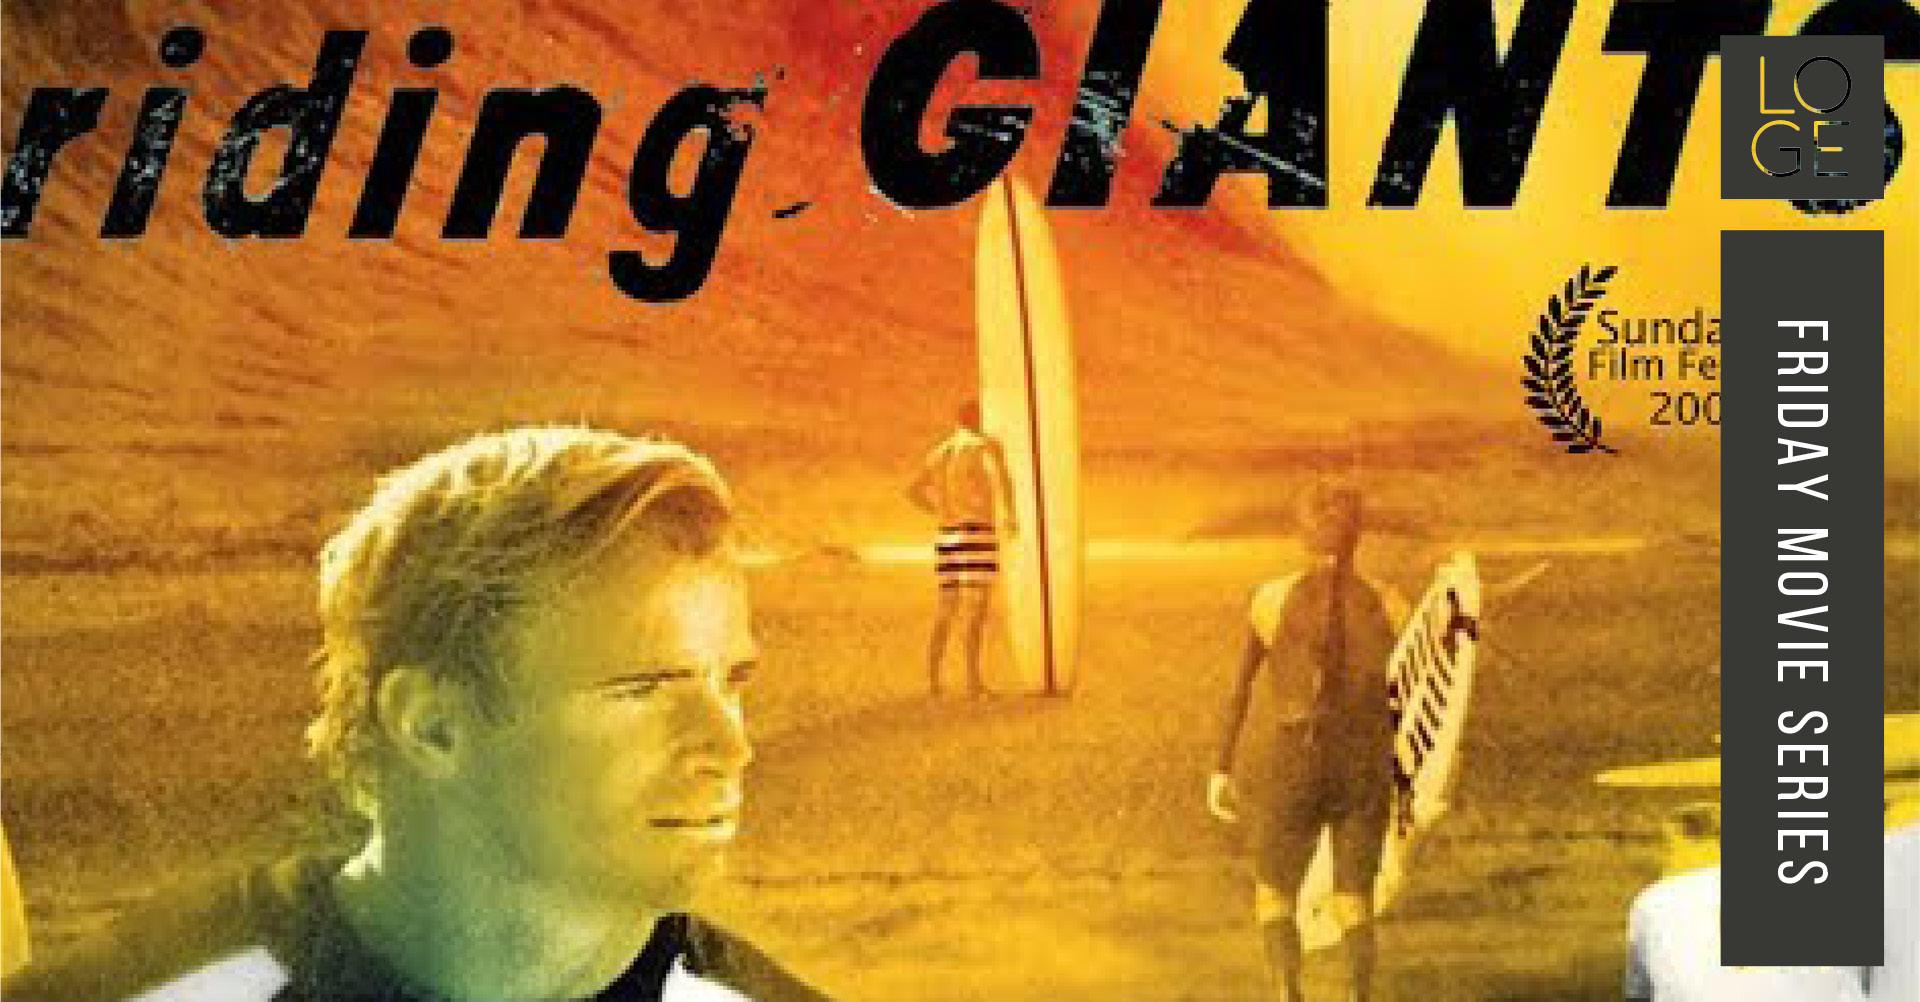 EC_Movie_RidingGiants.jpg